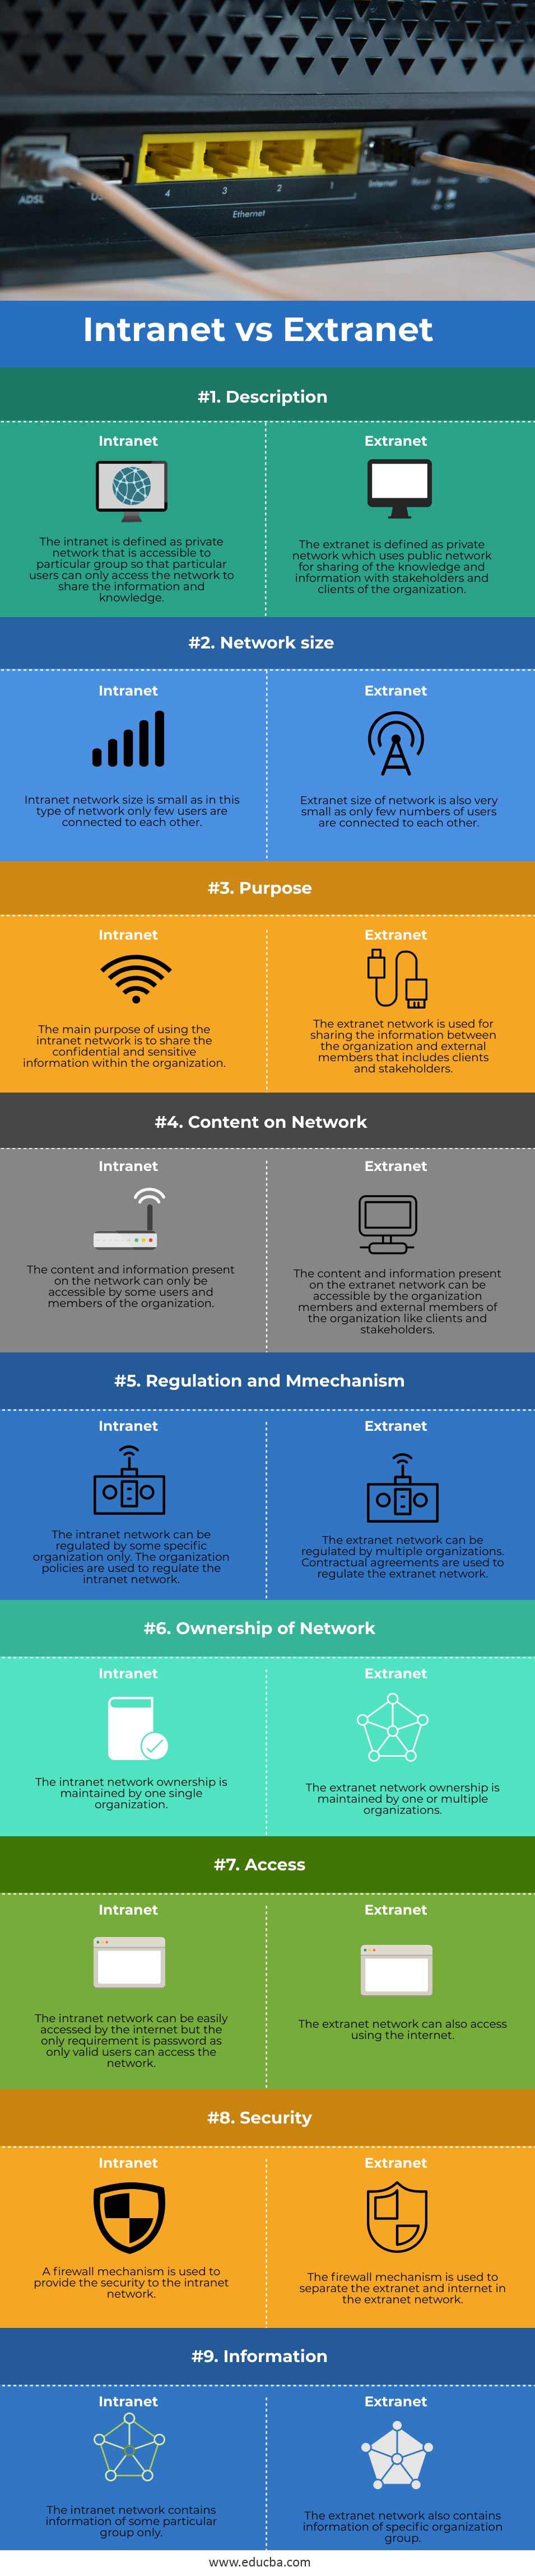 Intranet-vs-Extranet-info